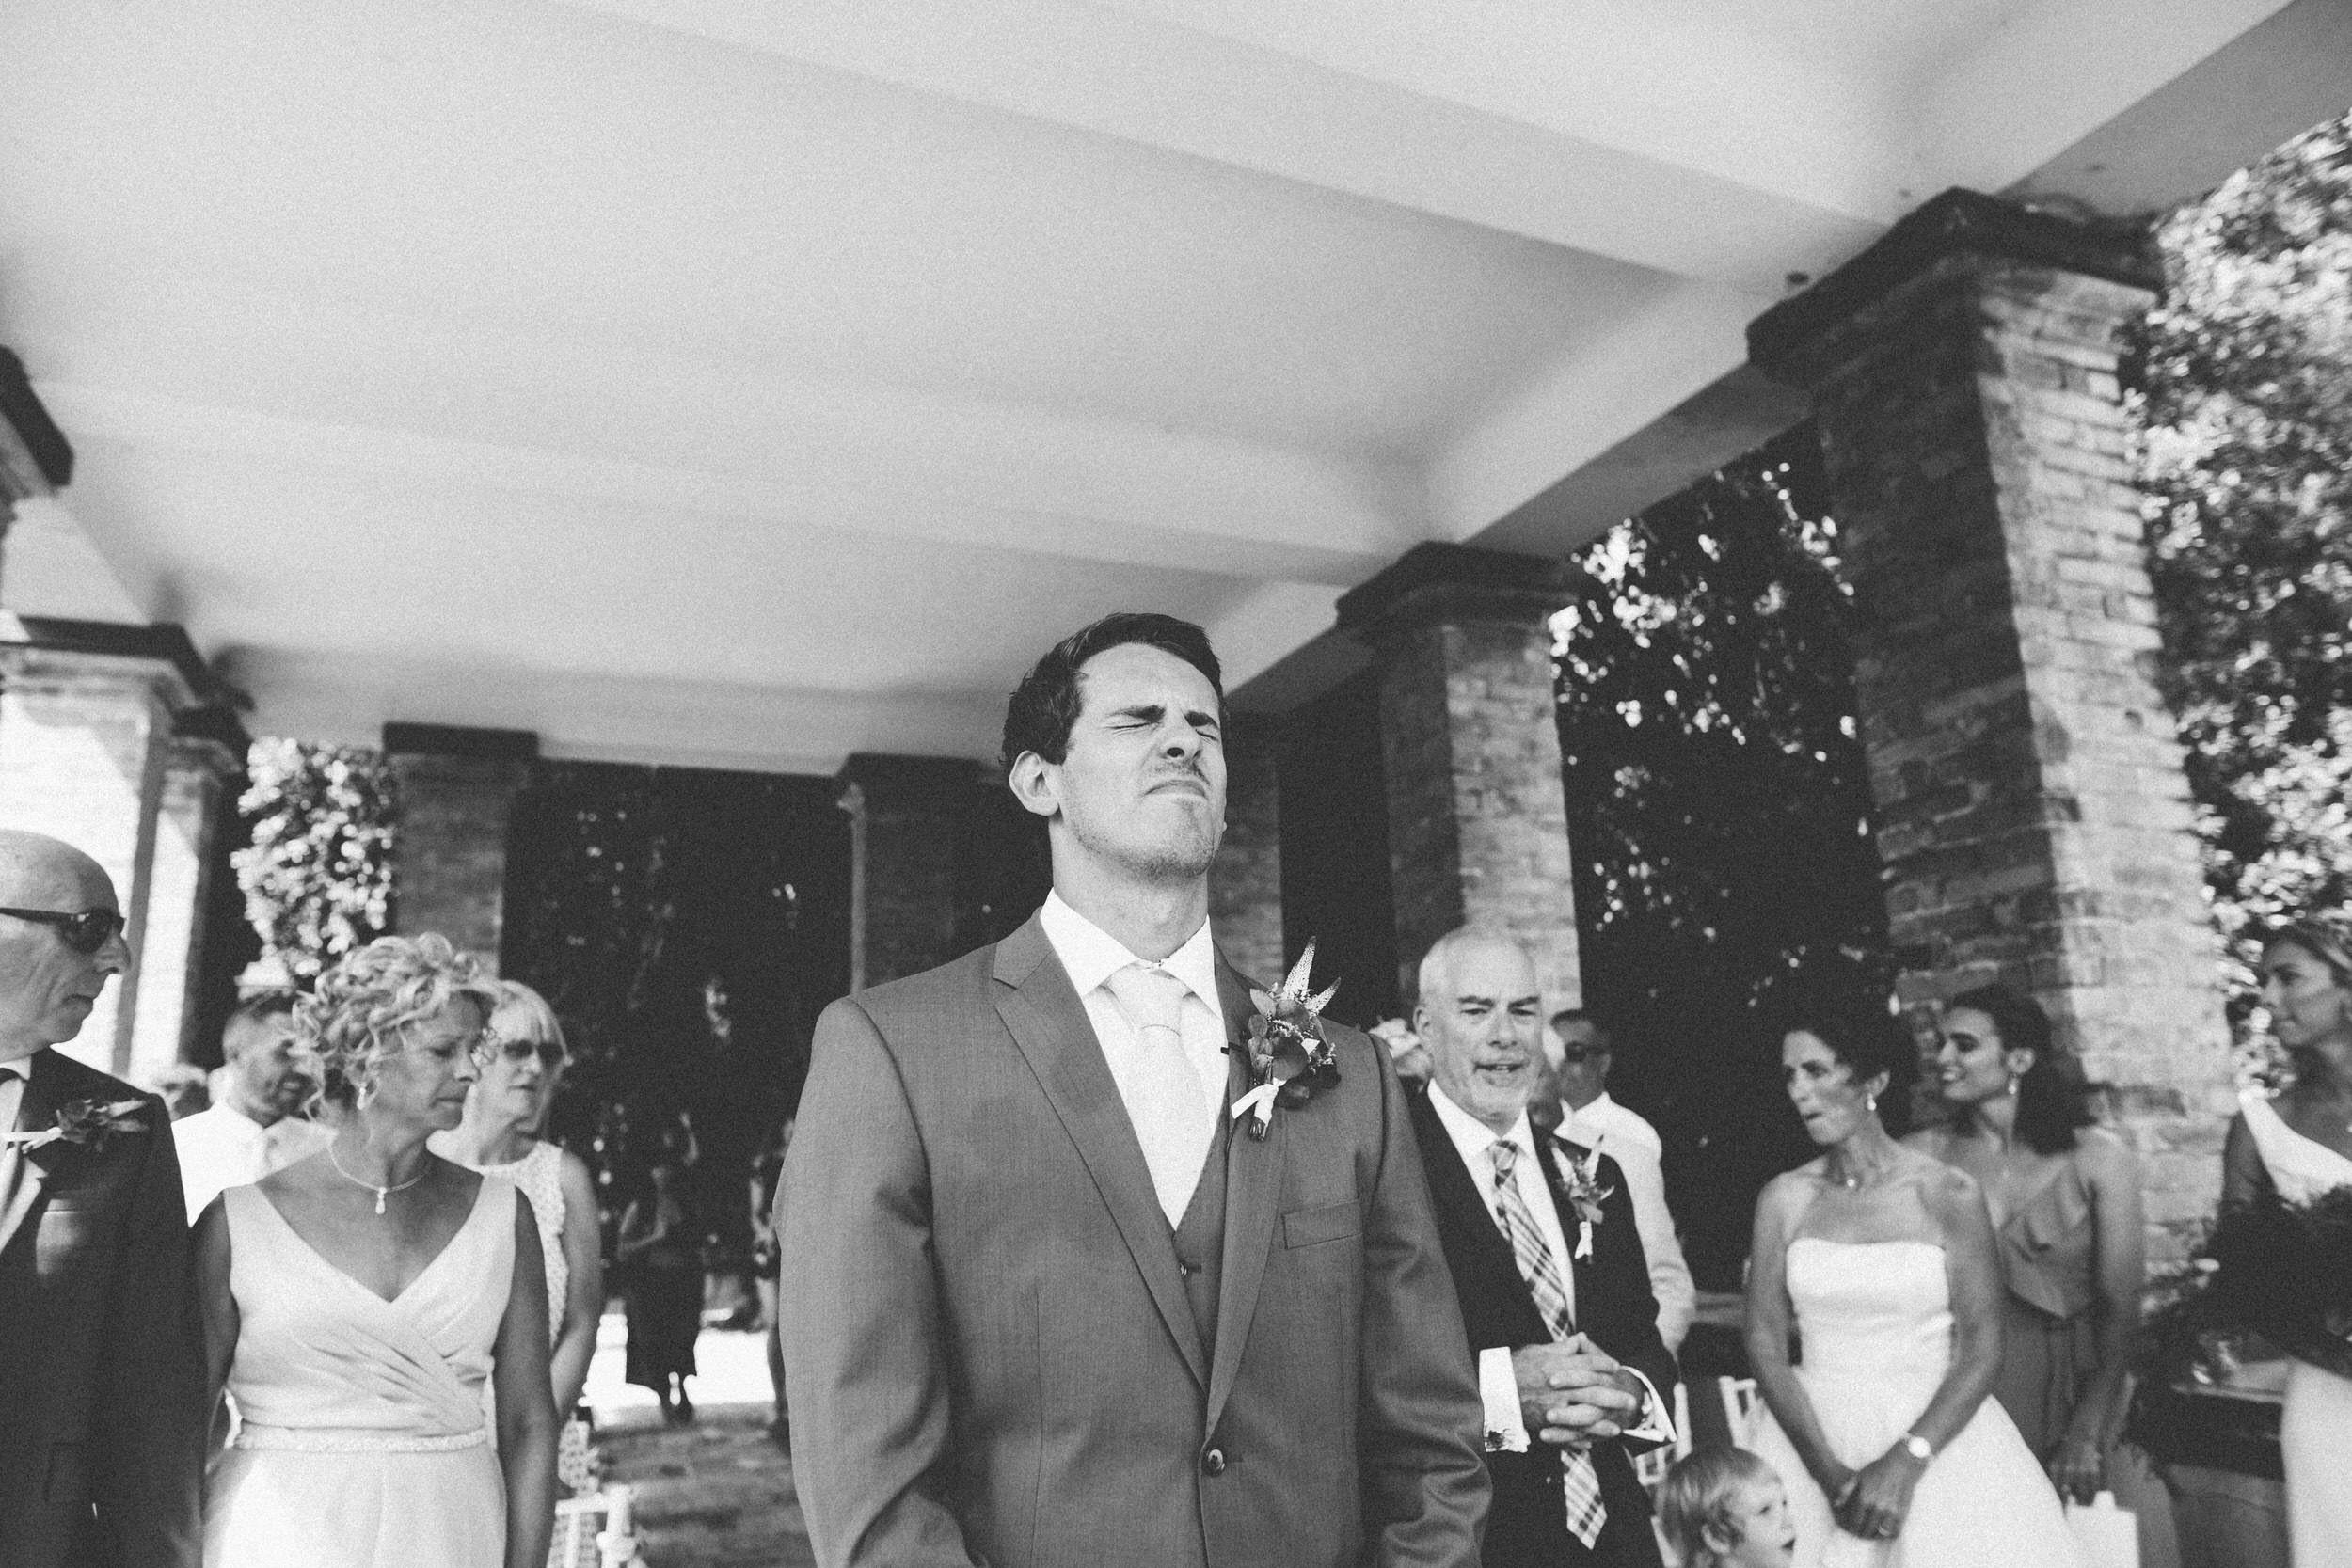 Quirky Wedding Photographer Scotland Glasgow Edinburgh Mirrorbox 056.jpg